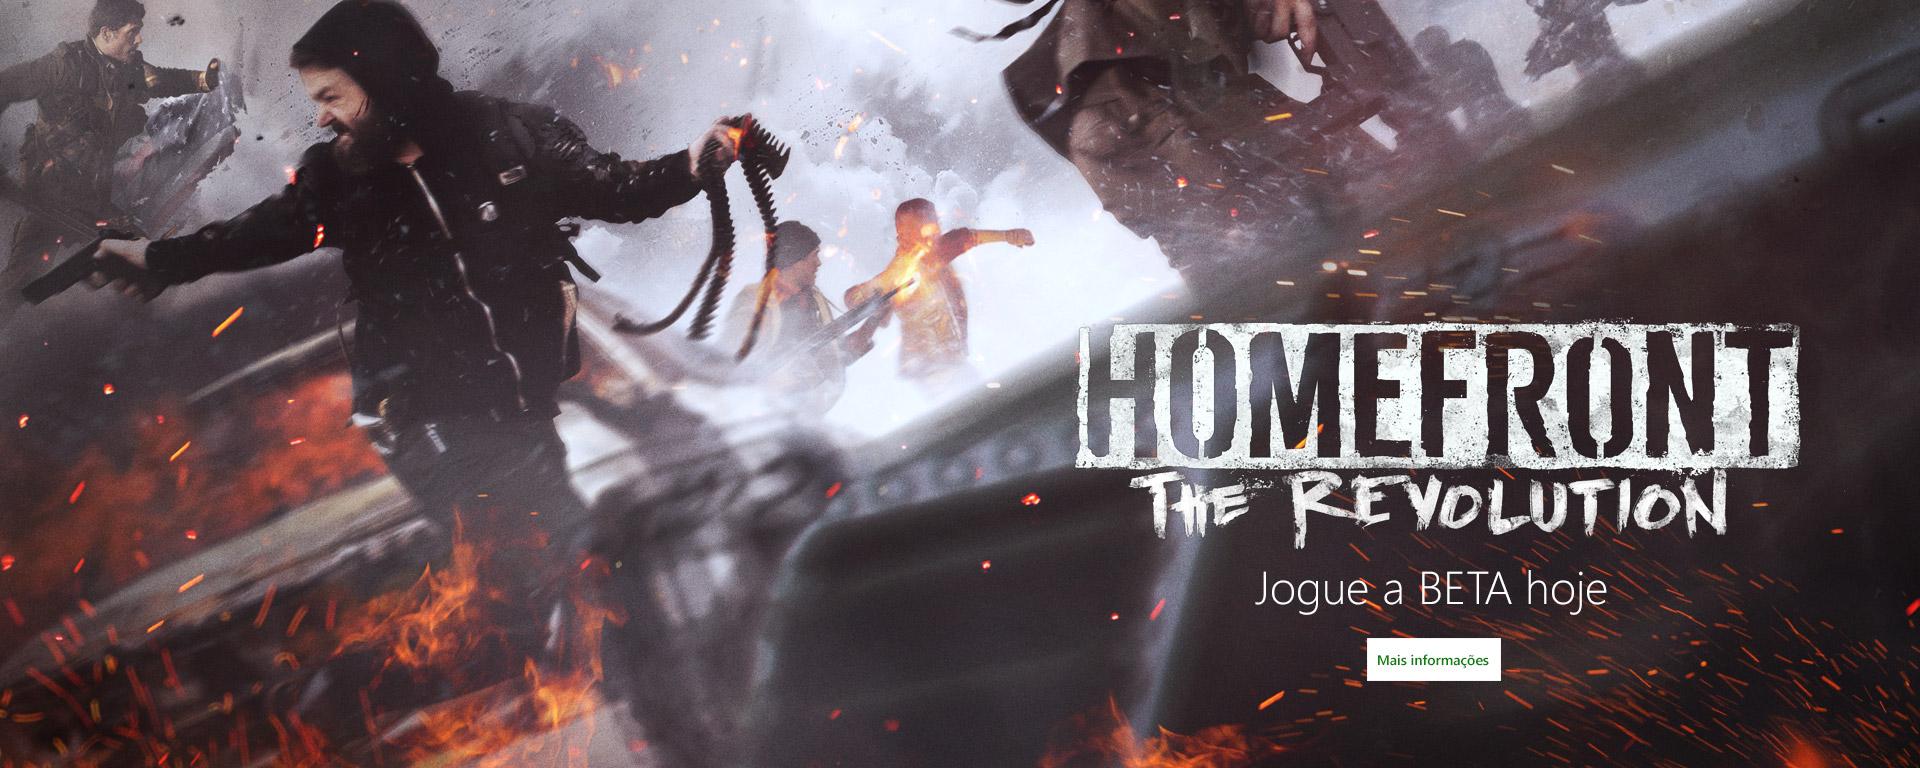 homefront beta